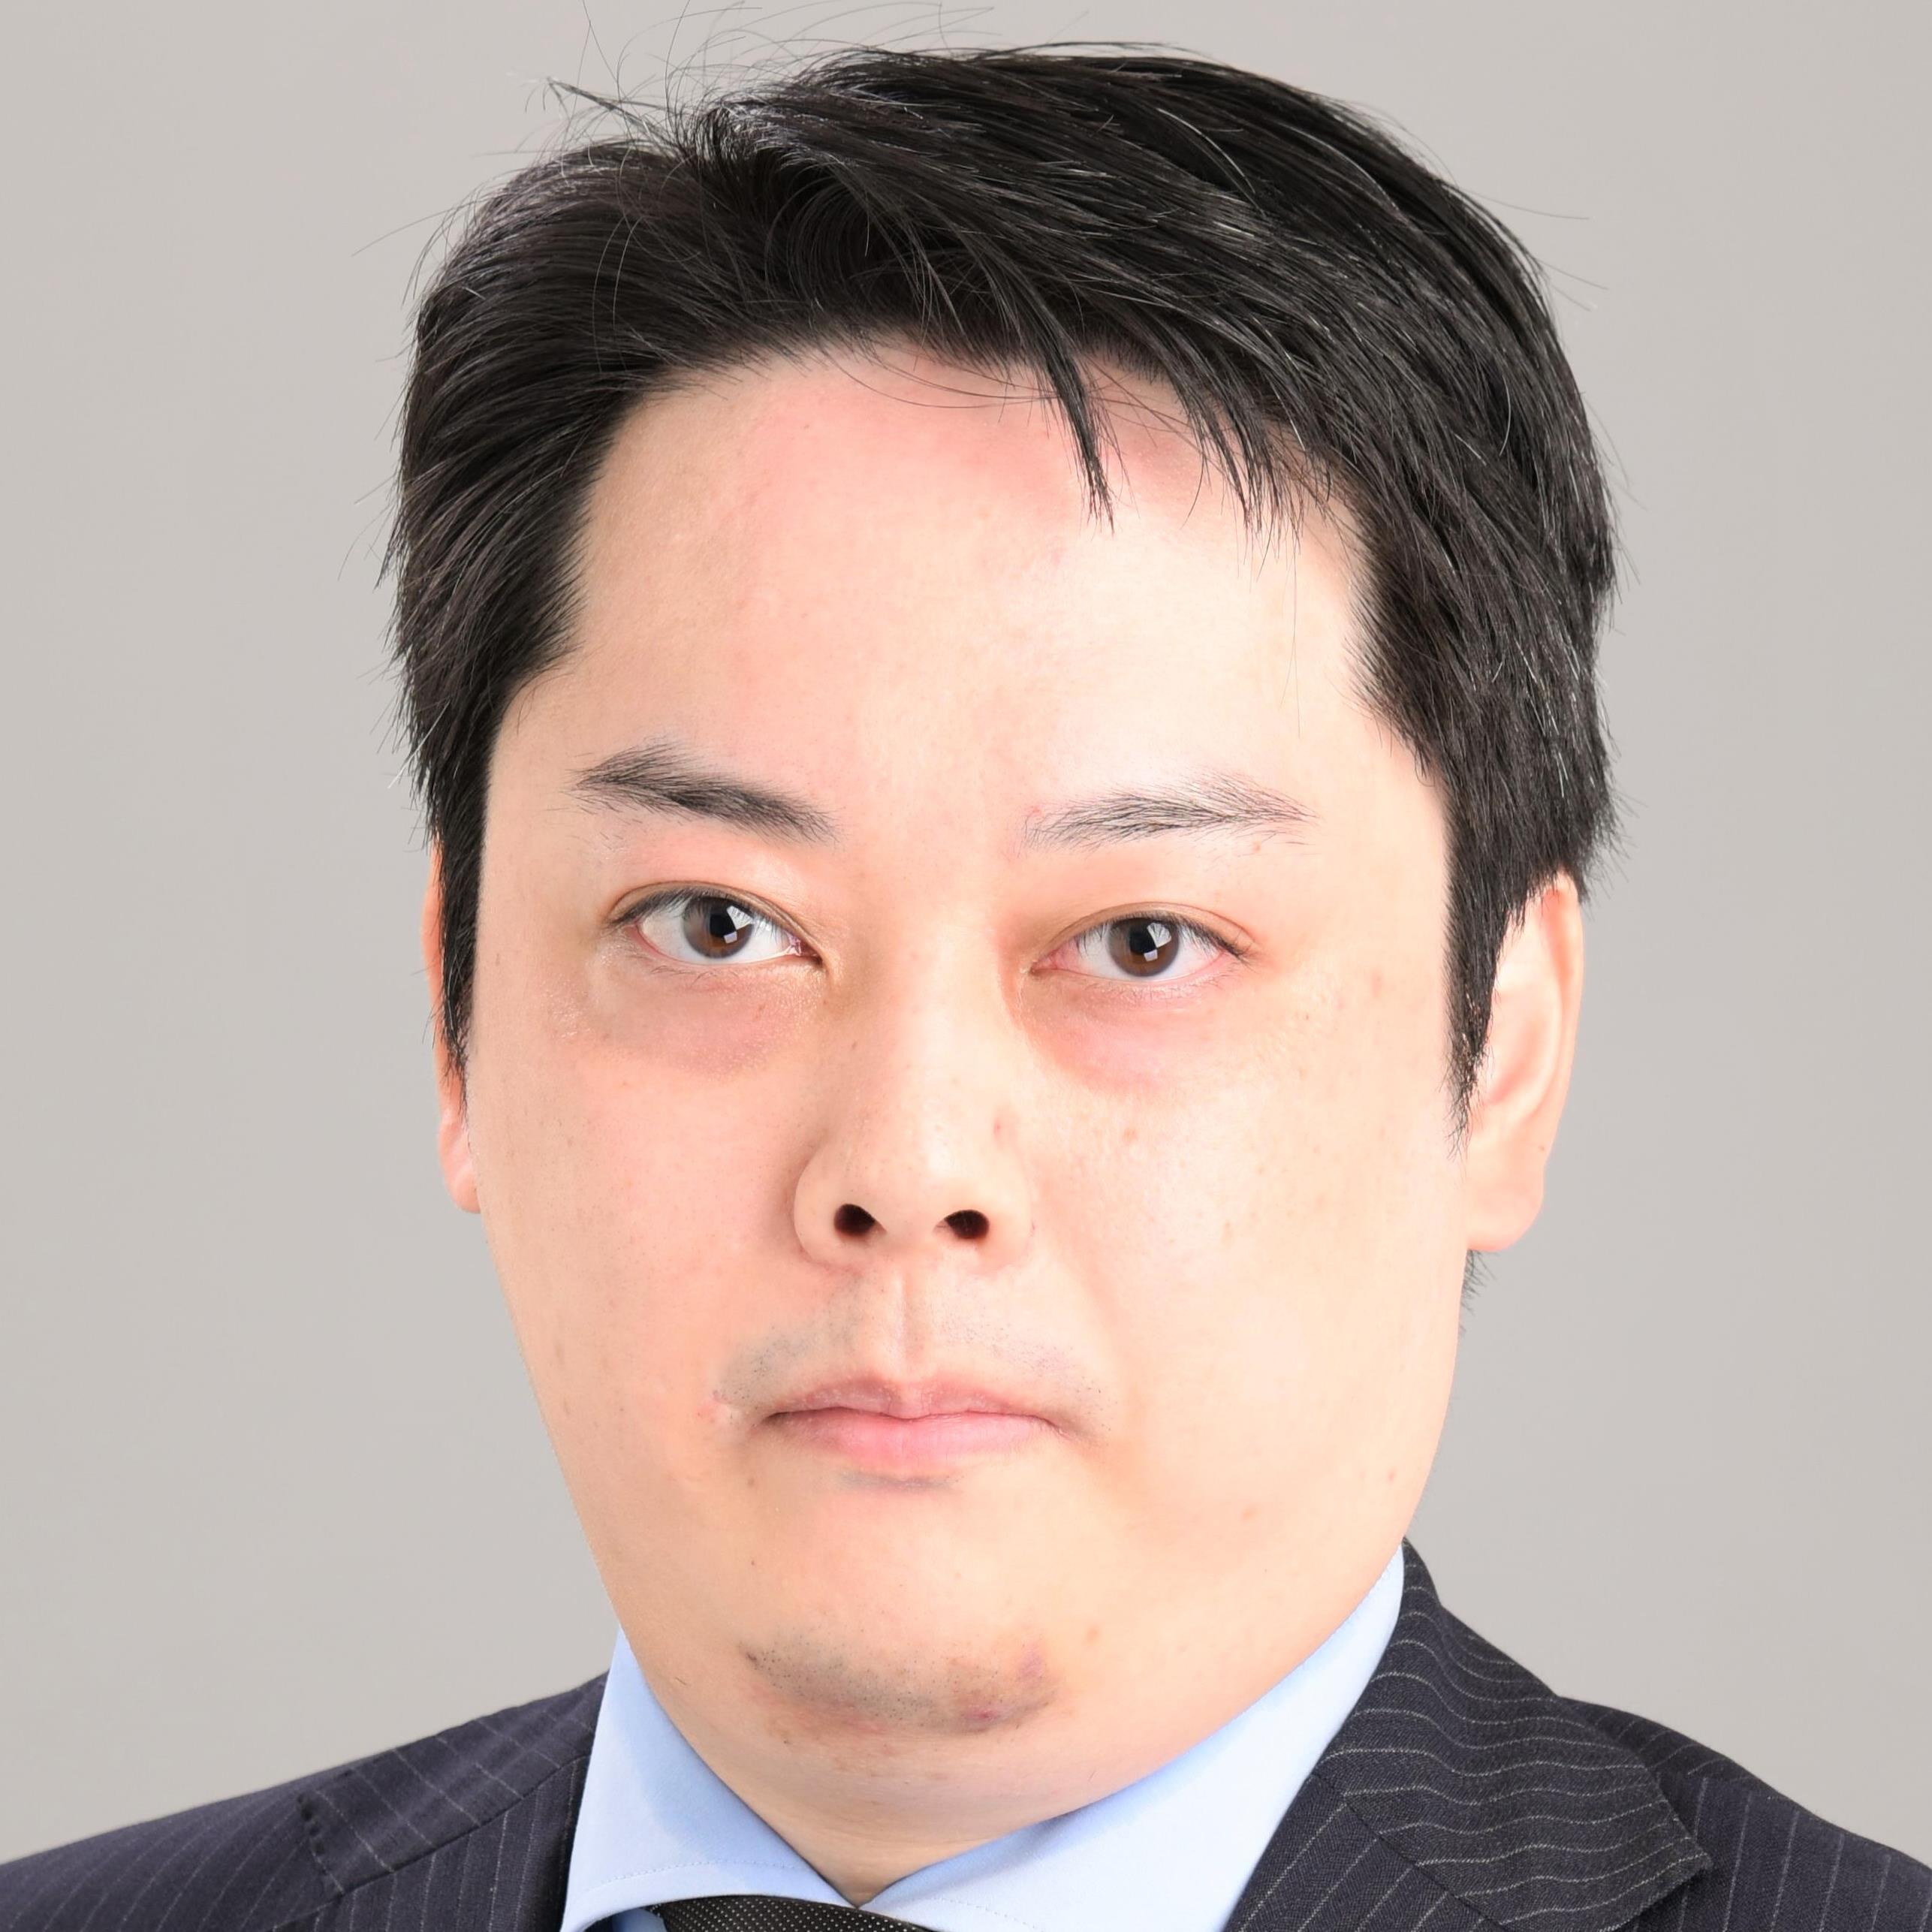 20200907_Masayuki Tsuruga.jpg